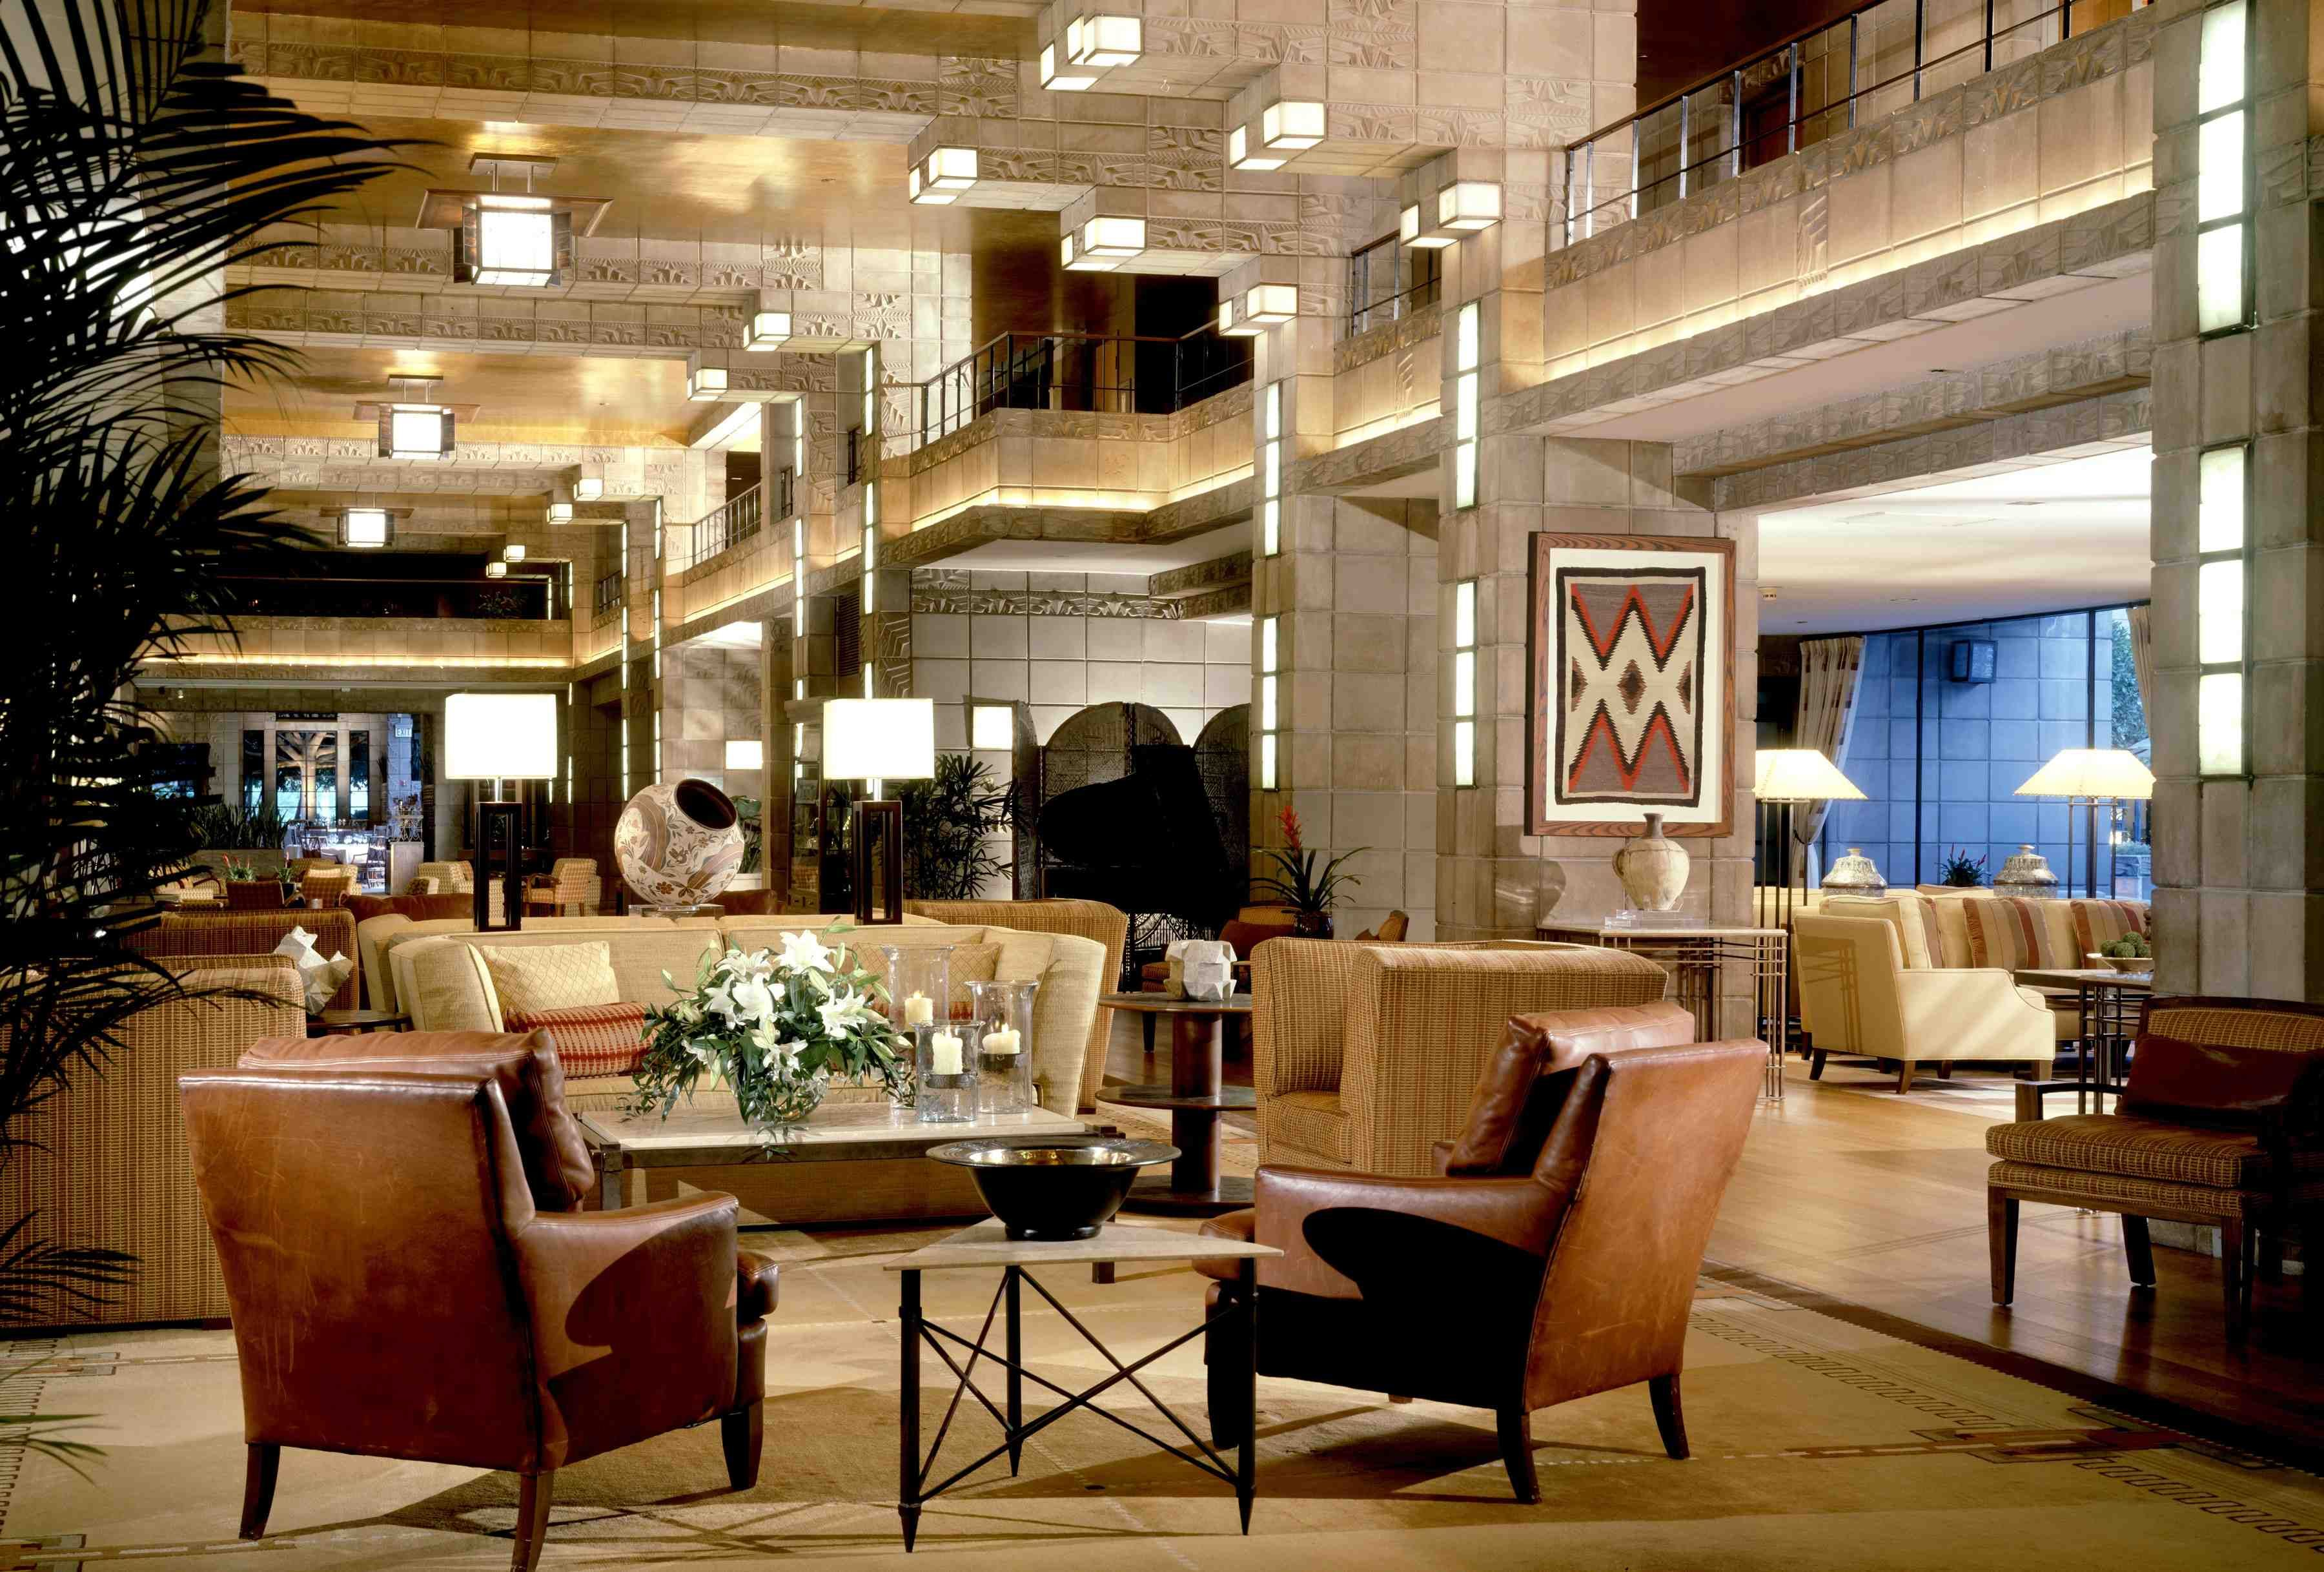 Arizona Biltmore Hotel Lobby Frank Lloyd Wright